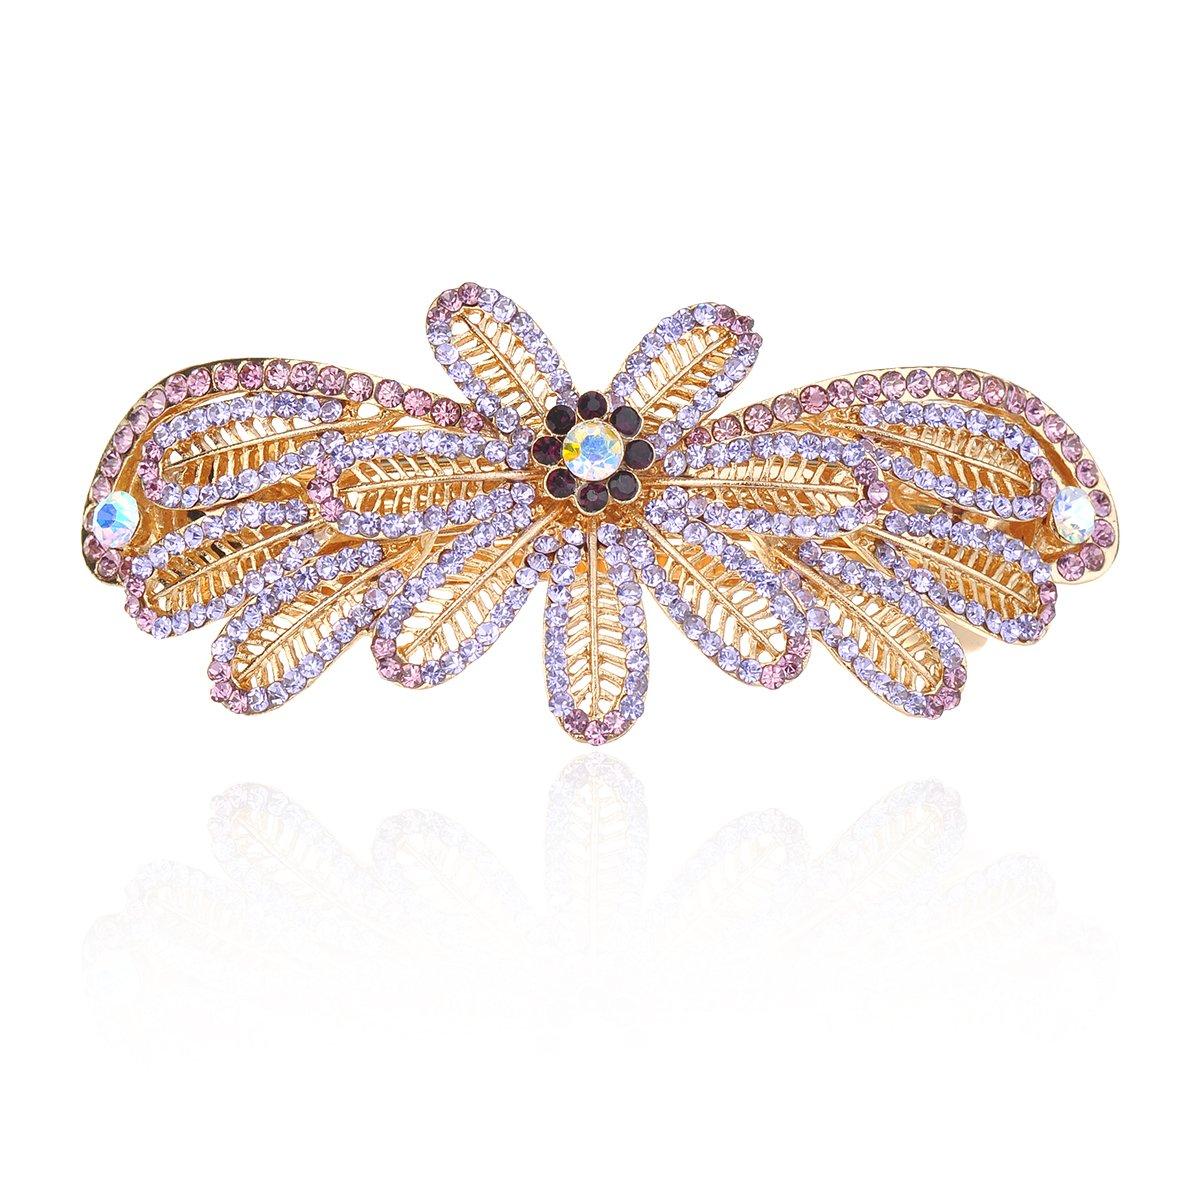 IPINK Women Gold Colorful Crystal Rhinestone Barrette Hair Clip Hairpin (Style 3-Purple)